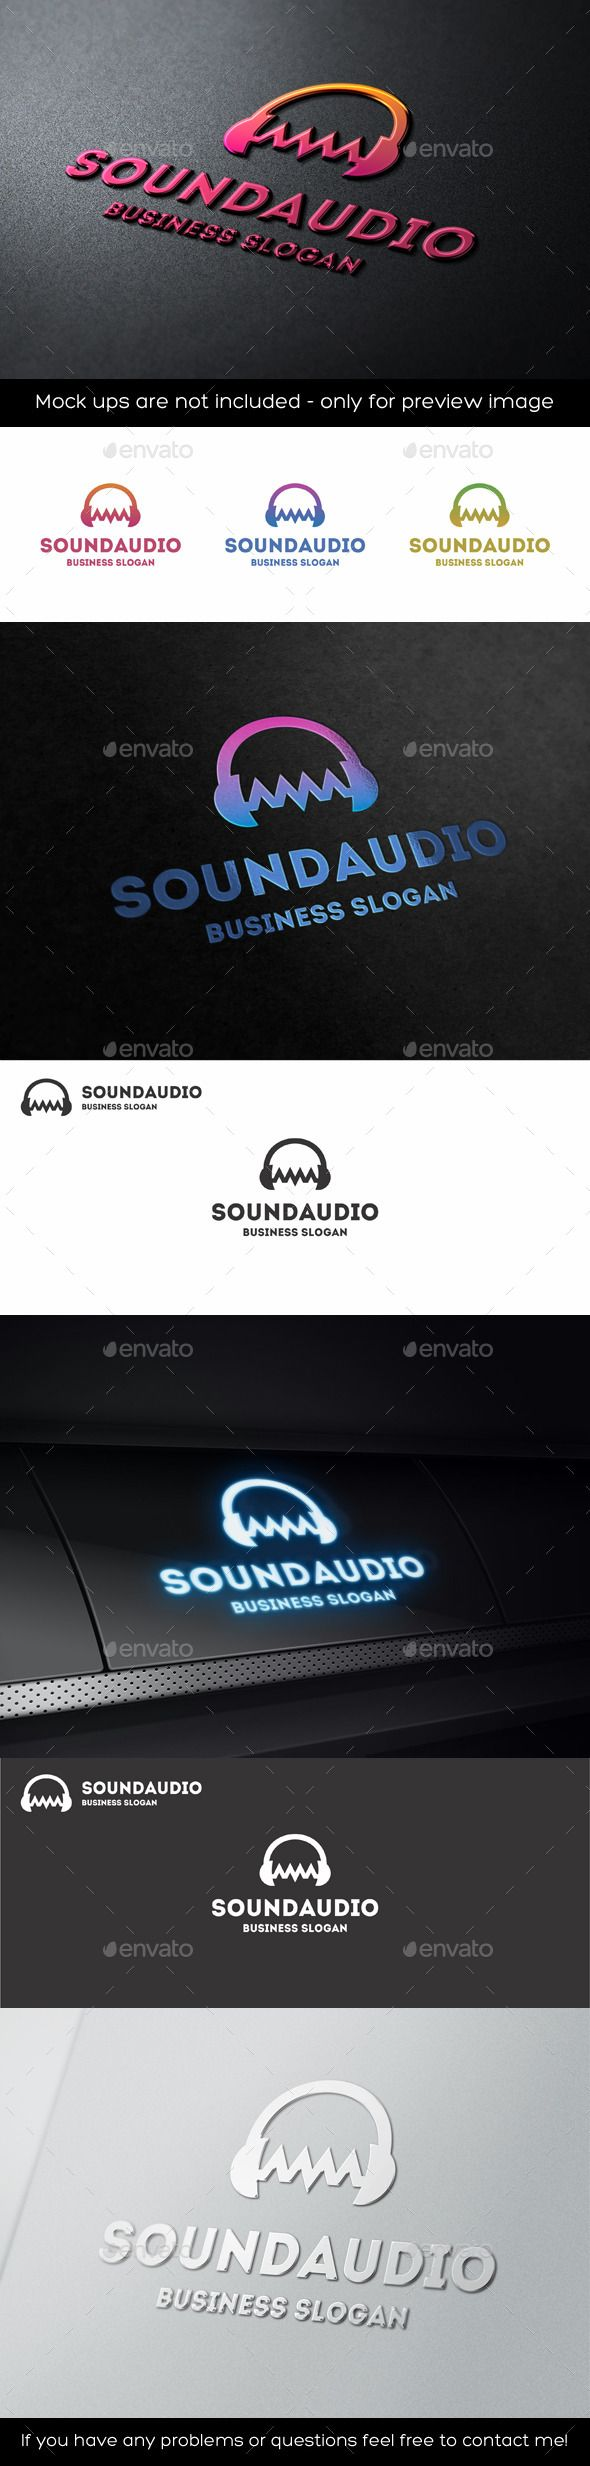 Audio Wave Sound Headphones Logo — Vector EPS #noise #recording studio • Available here → https://graphicriver.net/item/audio-wave-sound-headphones-logo/11341501?ref=pxcr